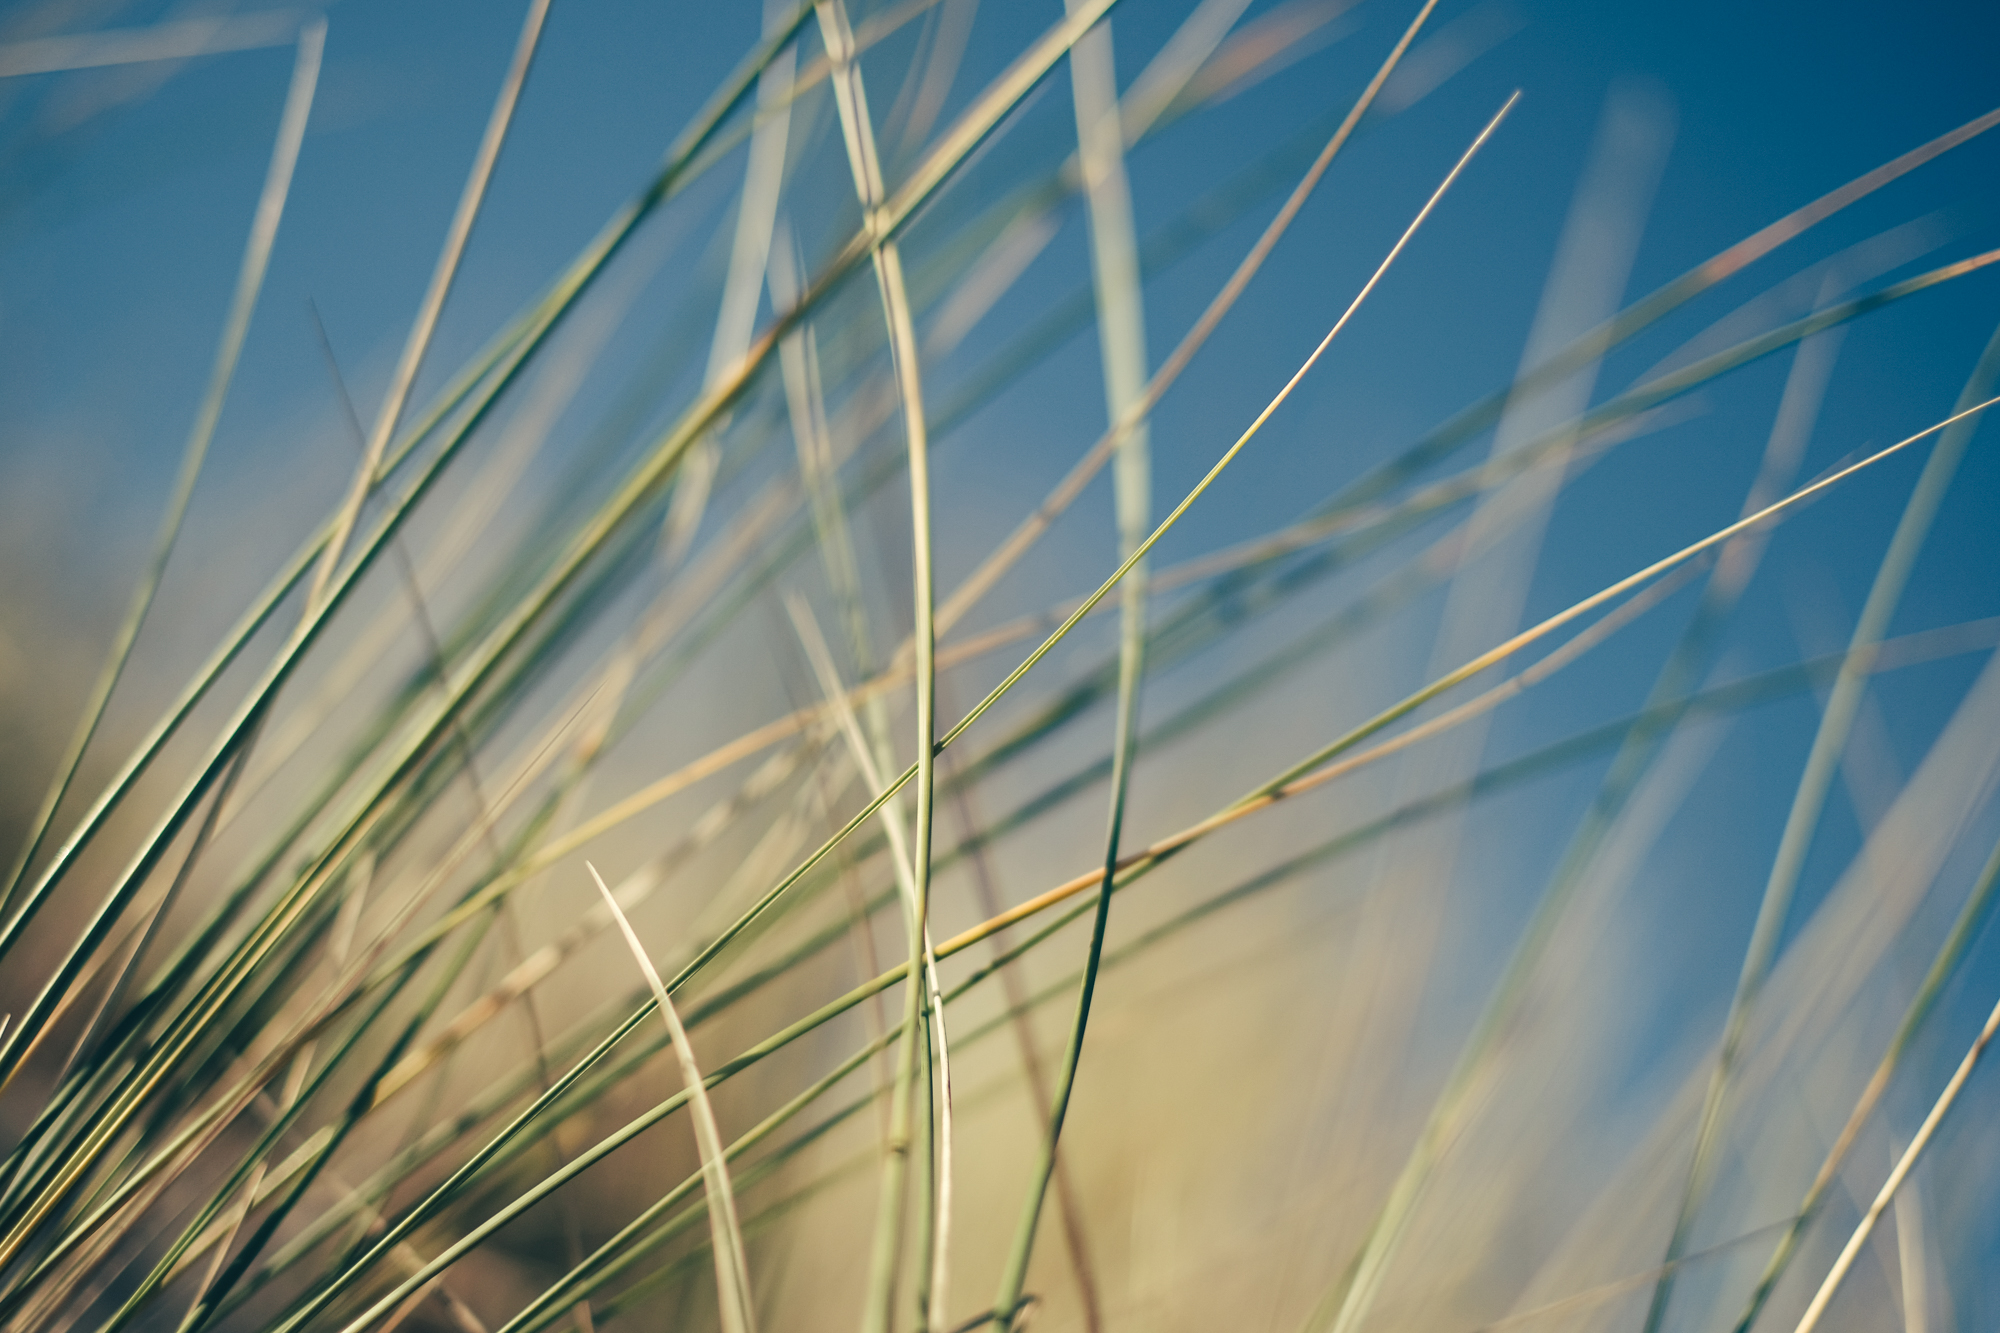 Wind blowing through grass Panel 3